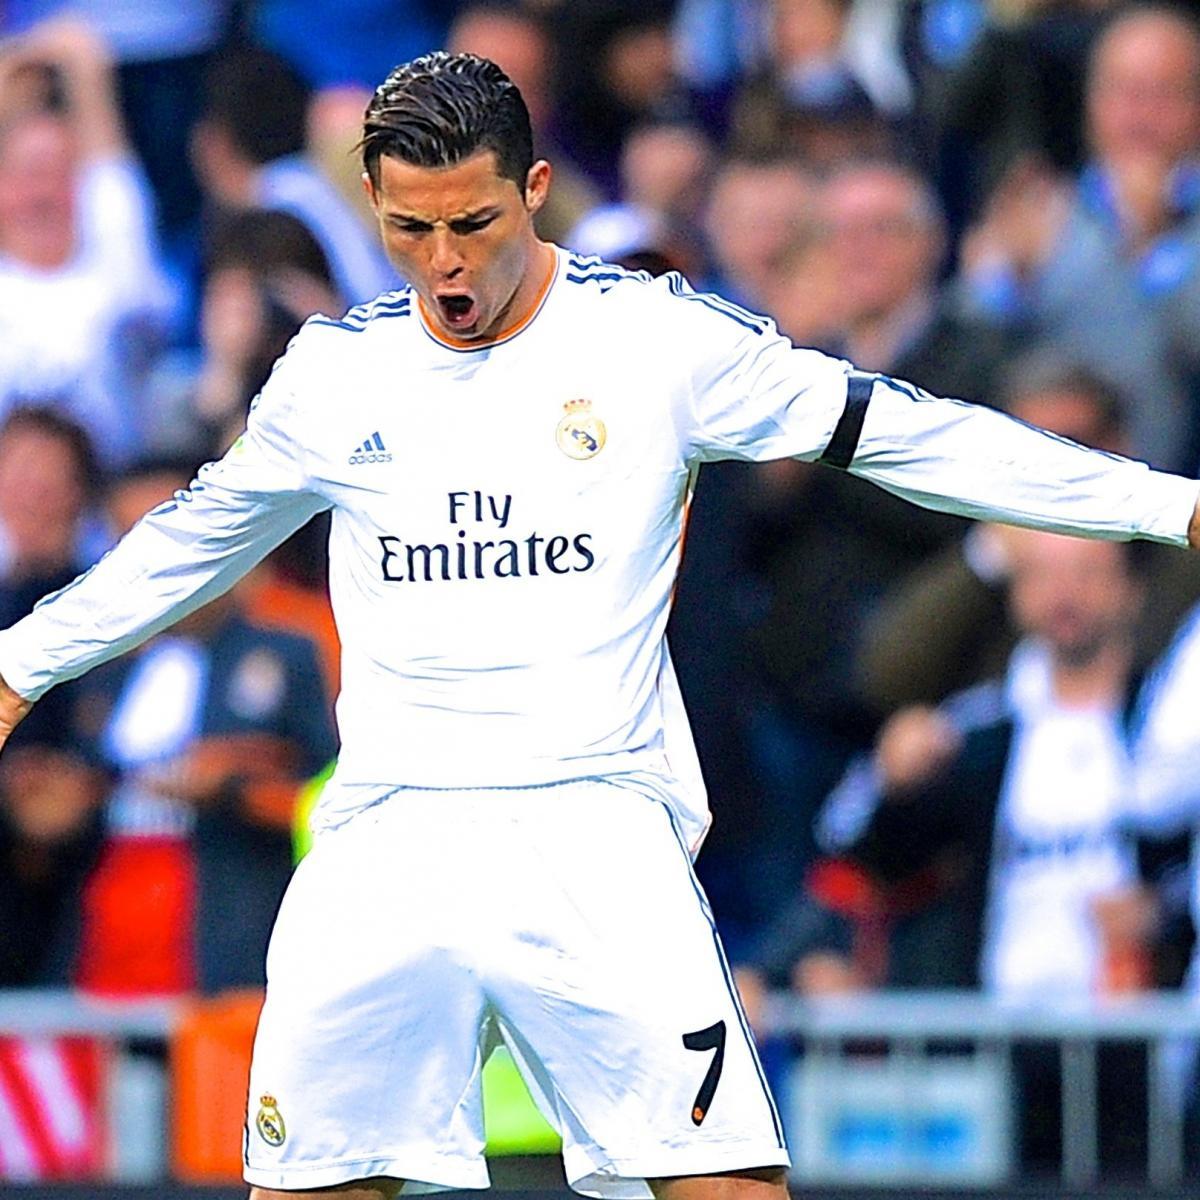 Cristiano Ronaldo S 4 Goals Lead Real Madrid To Win Vs: GIF: Cristiano Ronaldo Scores Two Golazos For Real Madrid